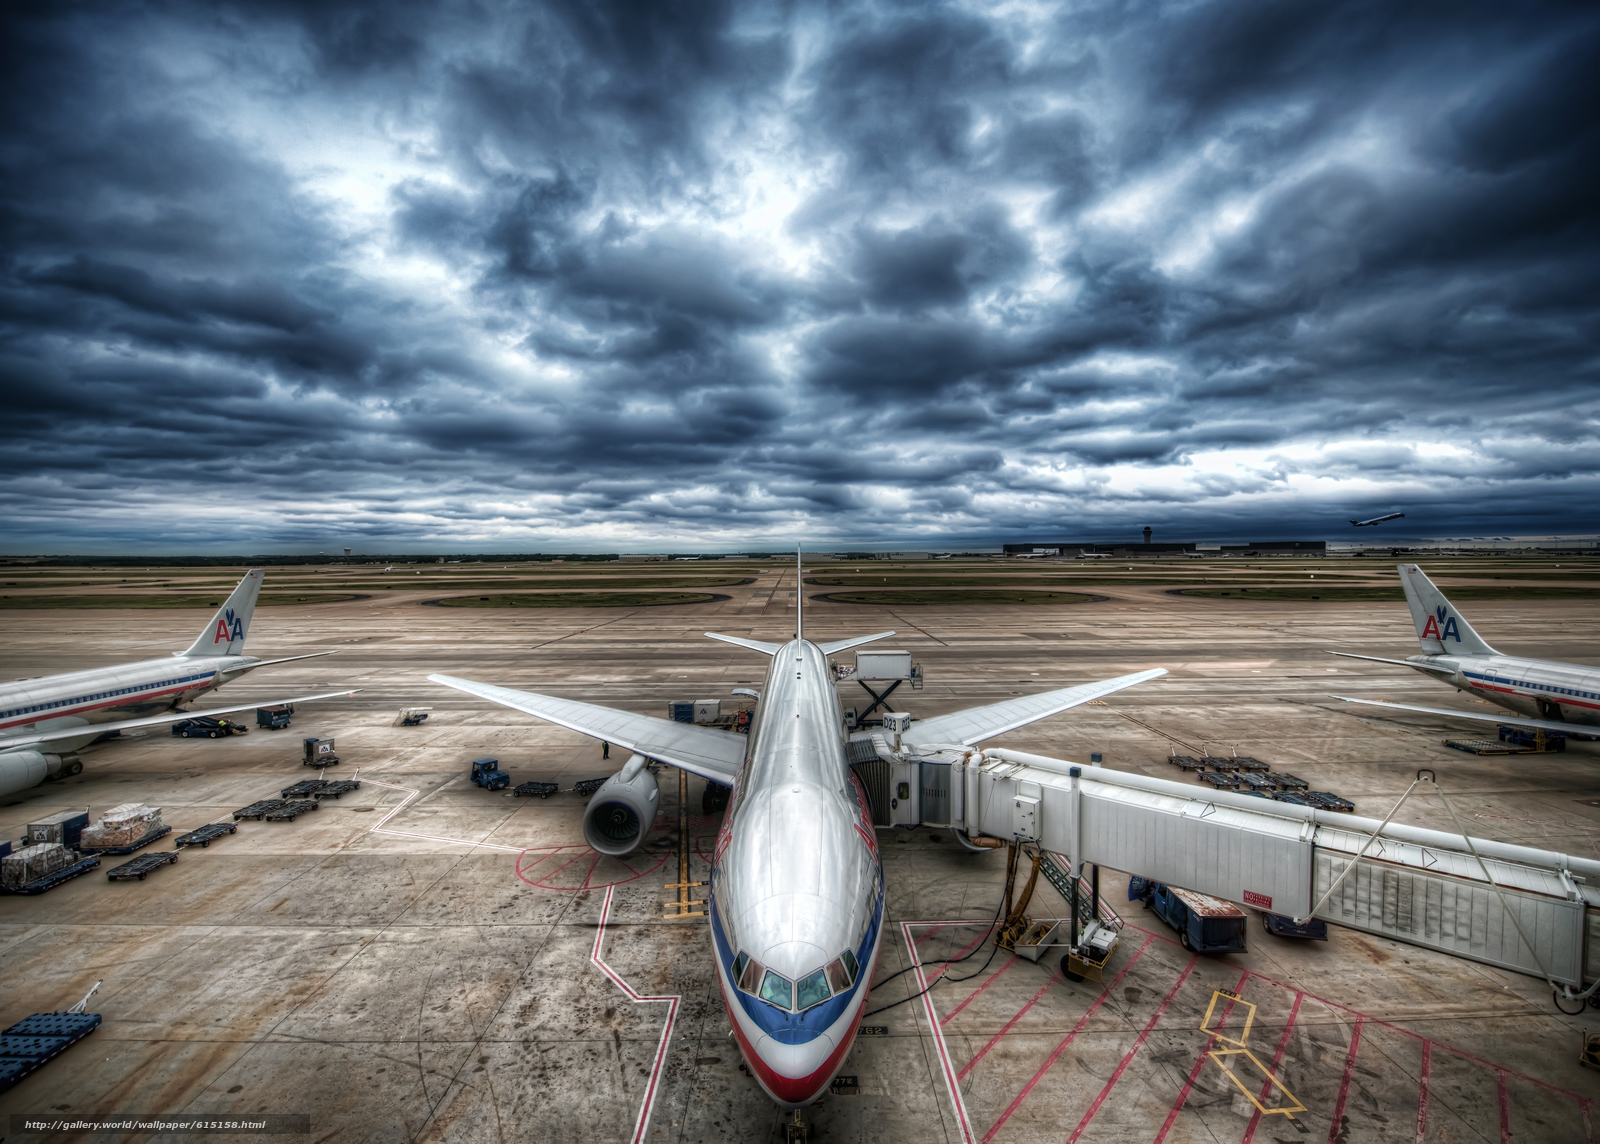 Скачать на телефон обои фото картинку на тему самолет, авиация, небо, тучи, грозовое небо, аэропорт, разширение 5593x4000